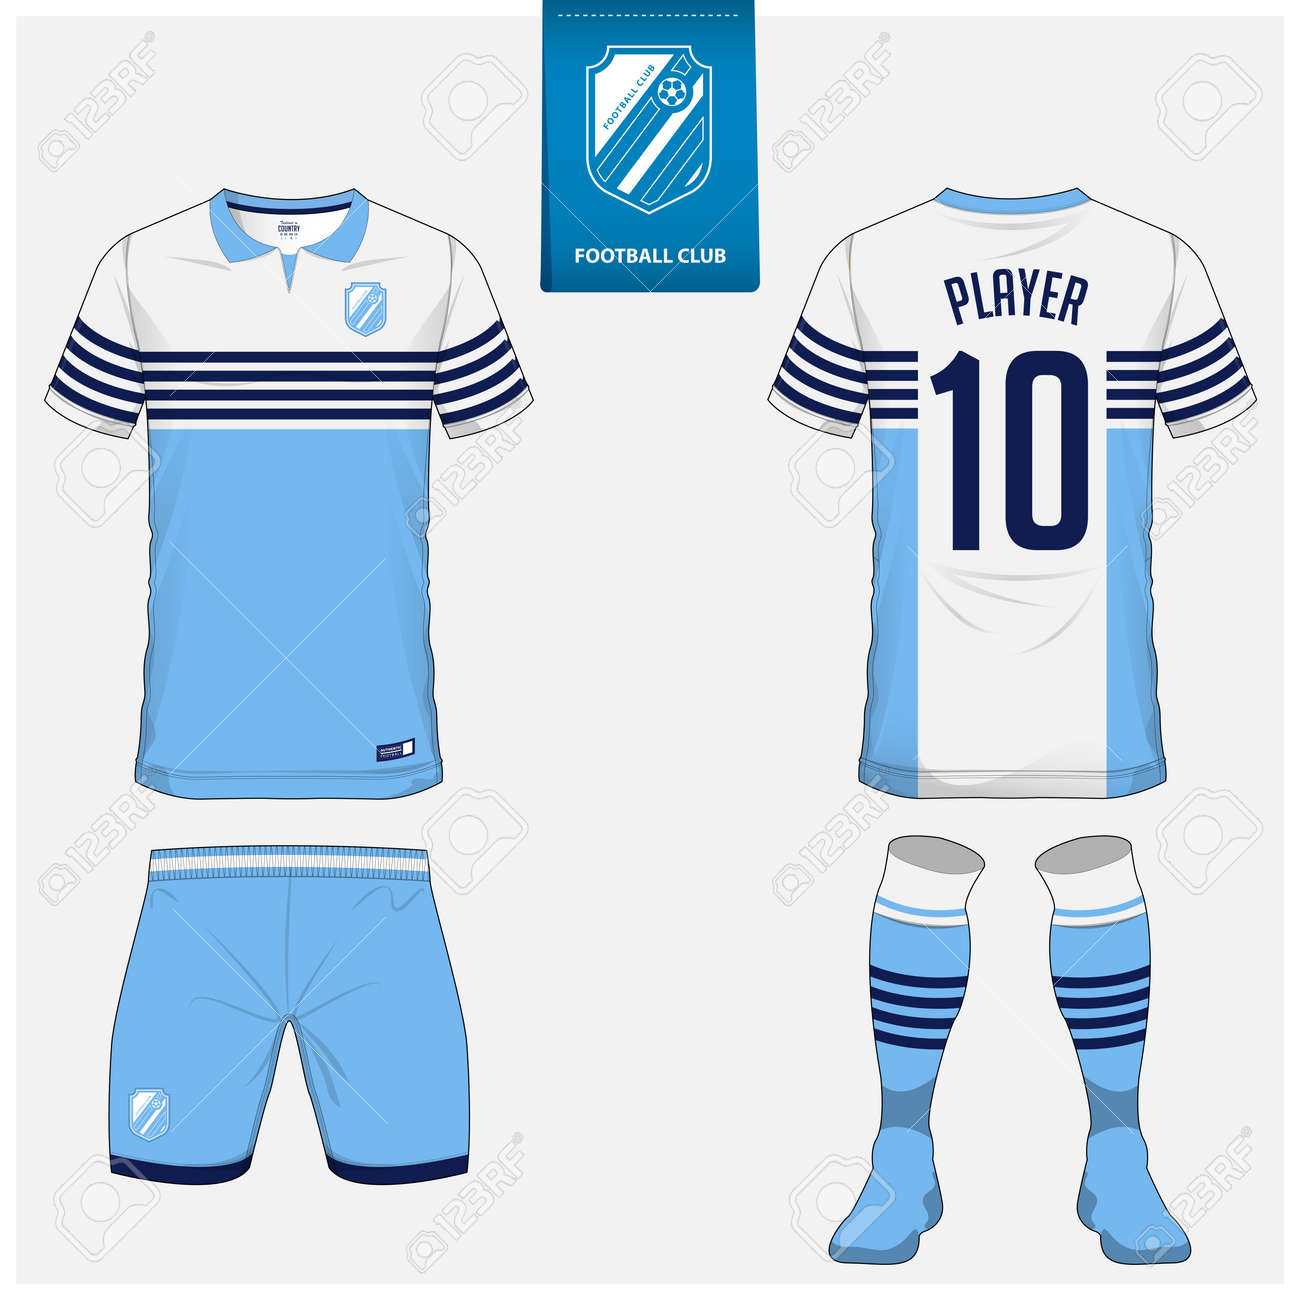 Soccer jersey or football kit, shorts, sock template design for